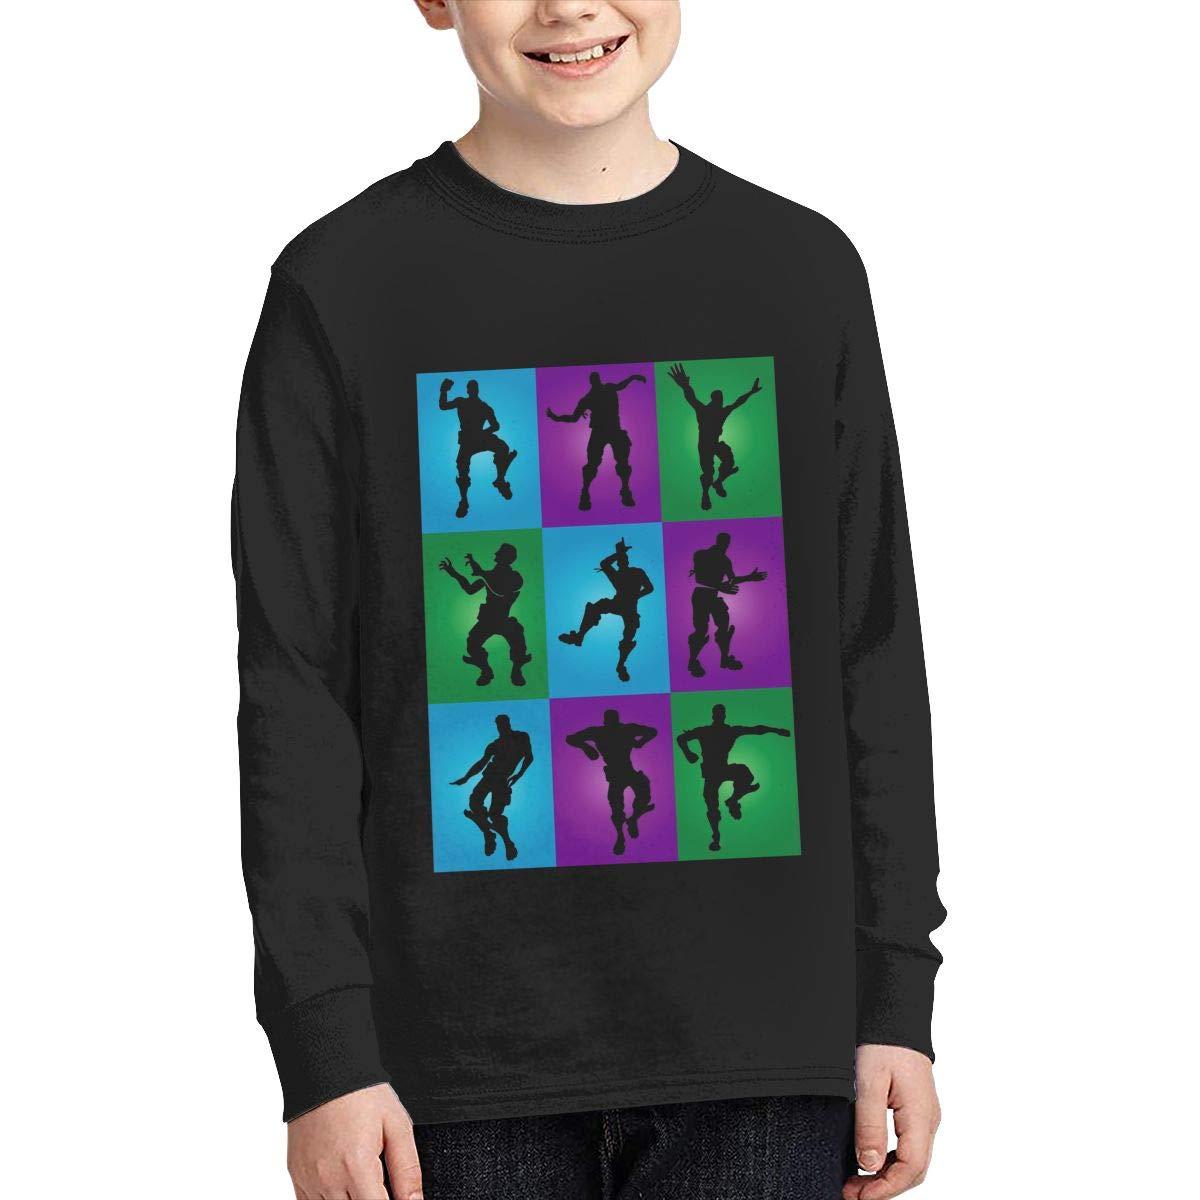 Asclkjzx Take The L Dance S Shirt Girls 2303